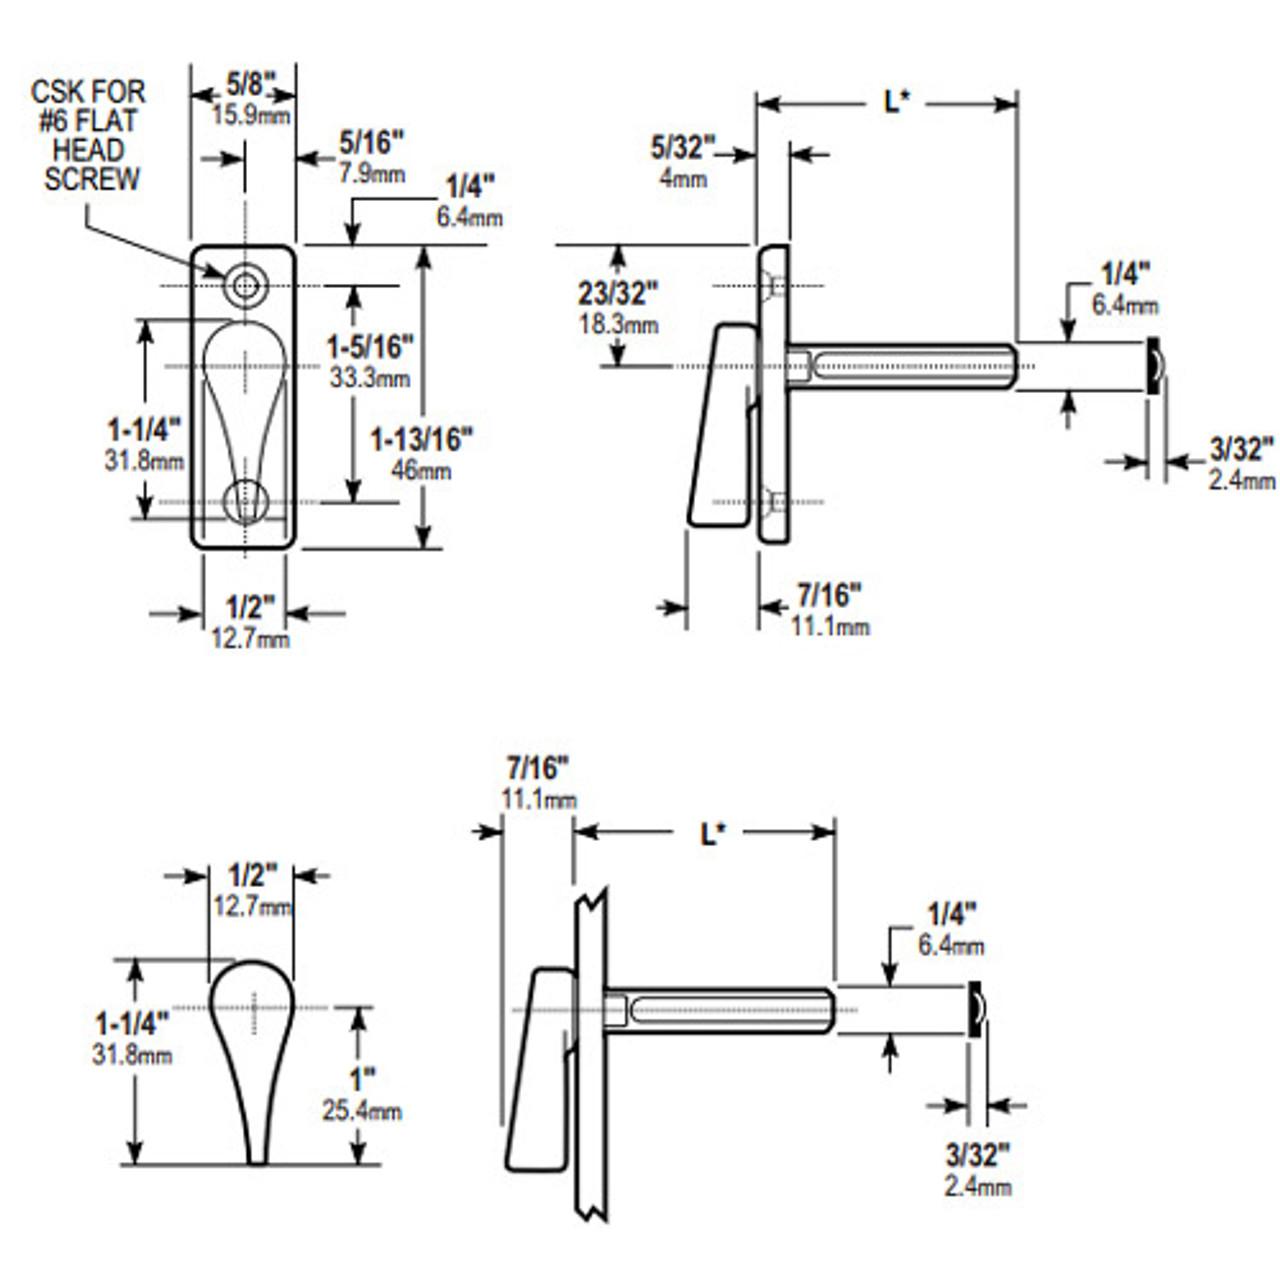 1000-11-23-119 Adams Rite 1000 Series Turns Dimensional View